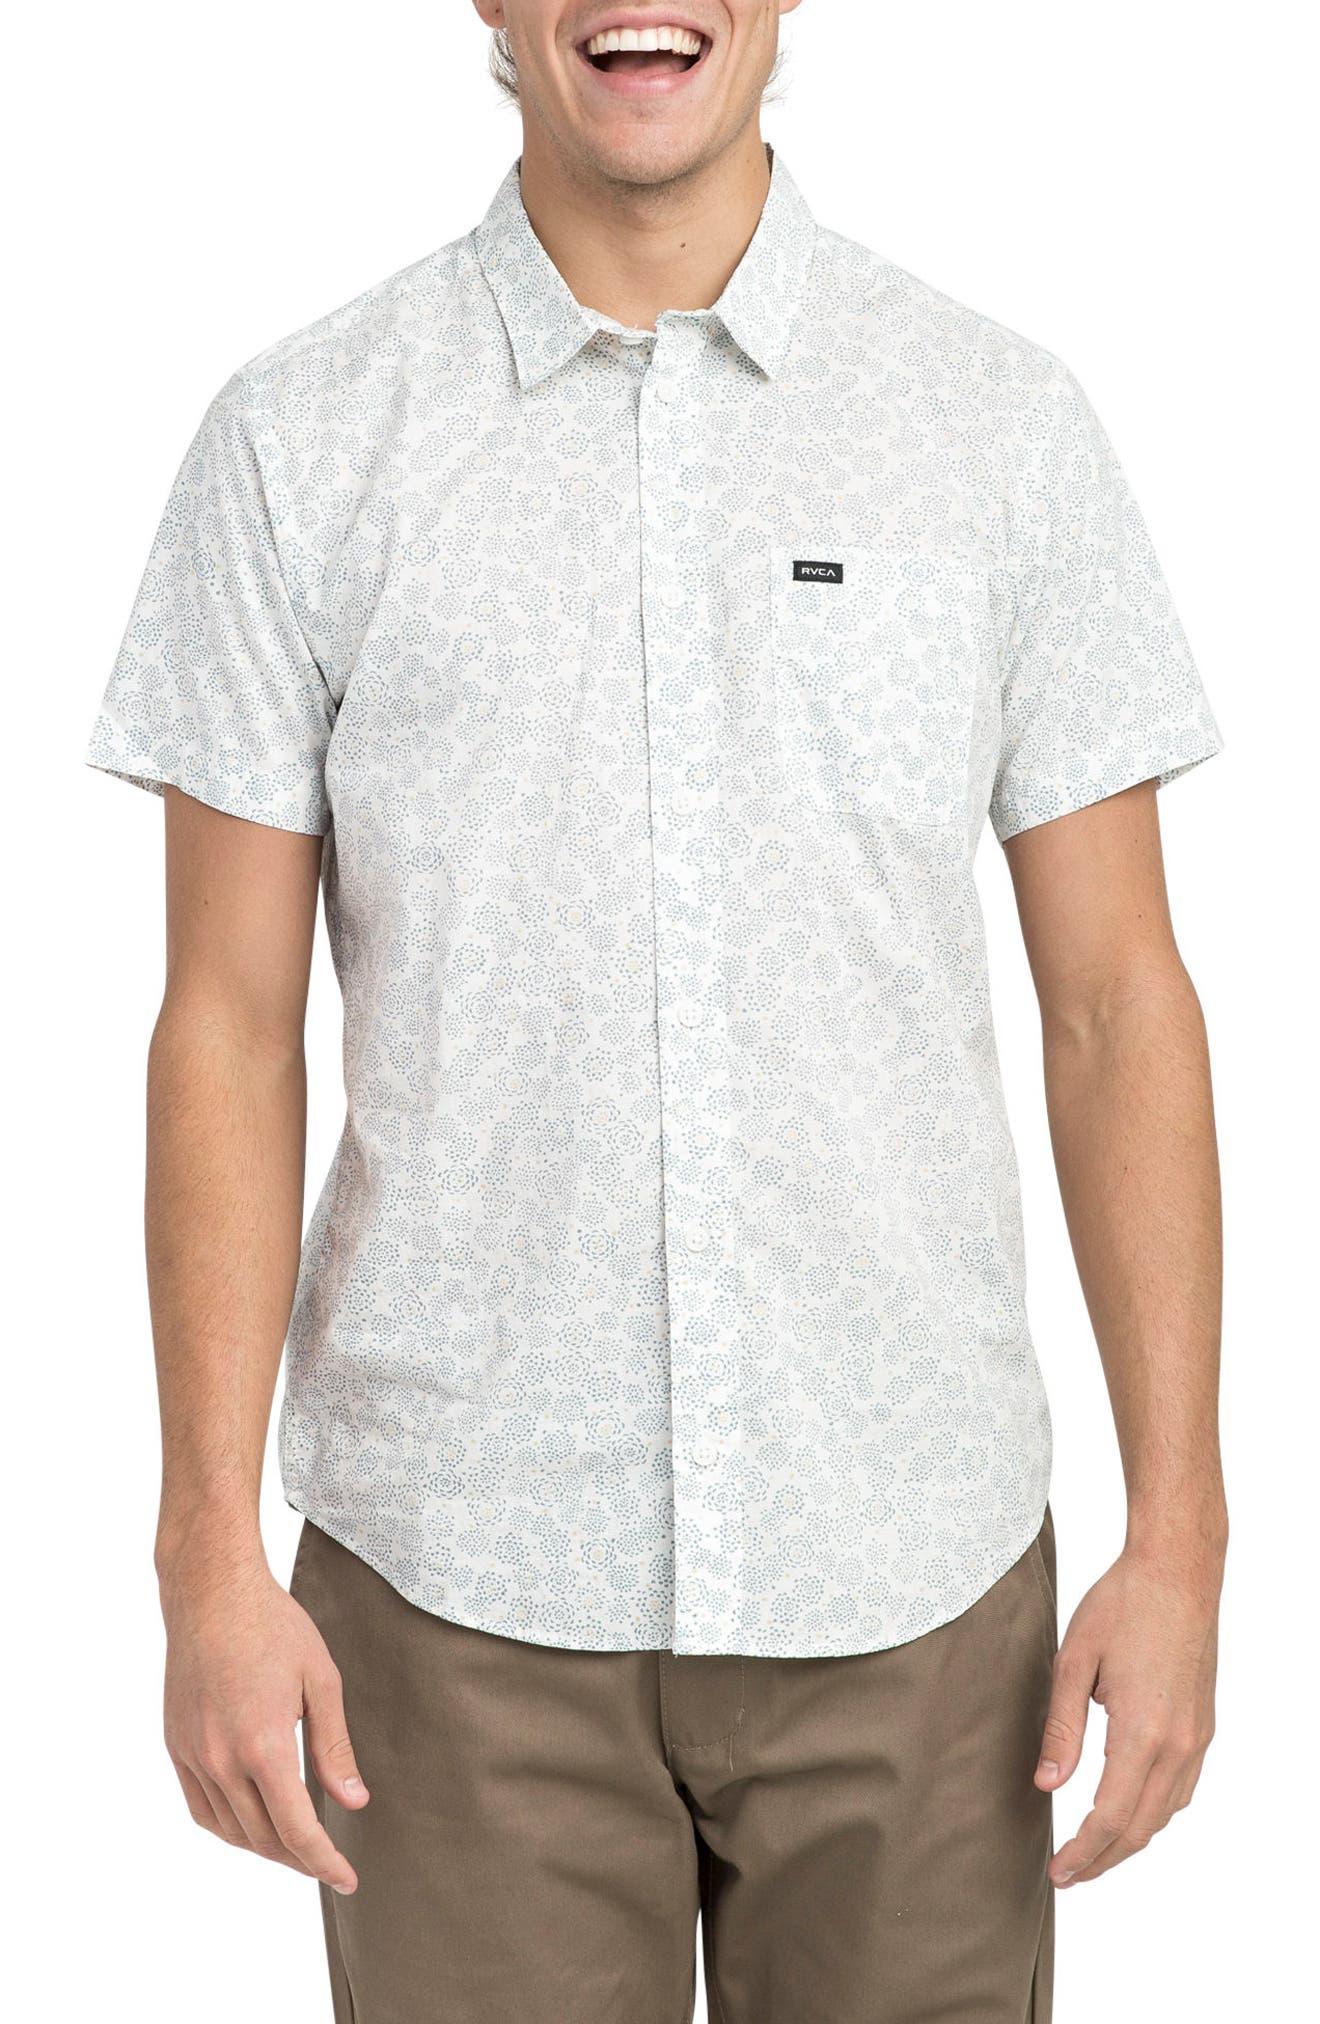 RVCA Cleta Woven Shirt